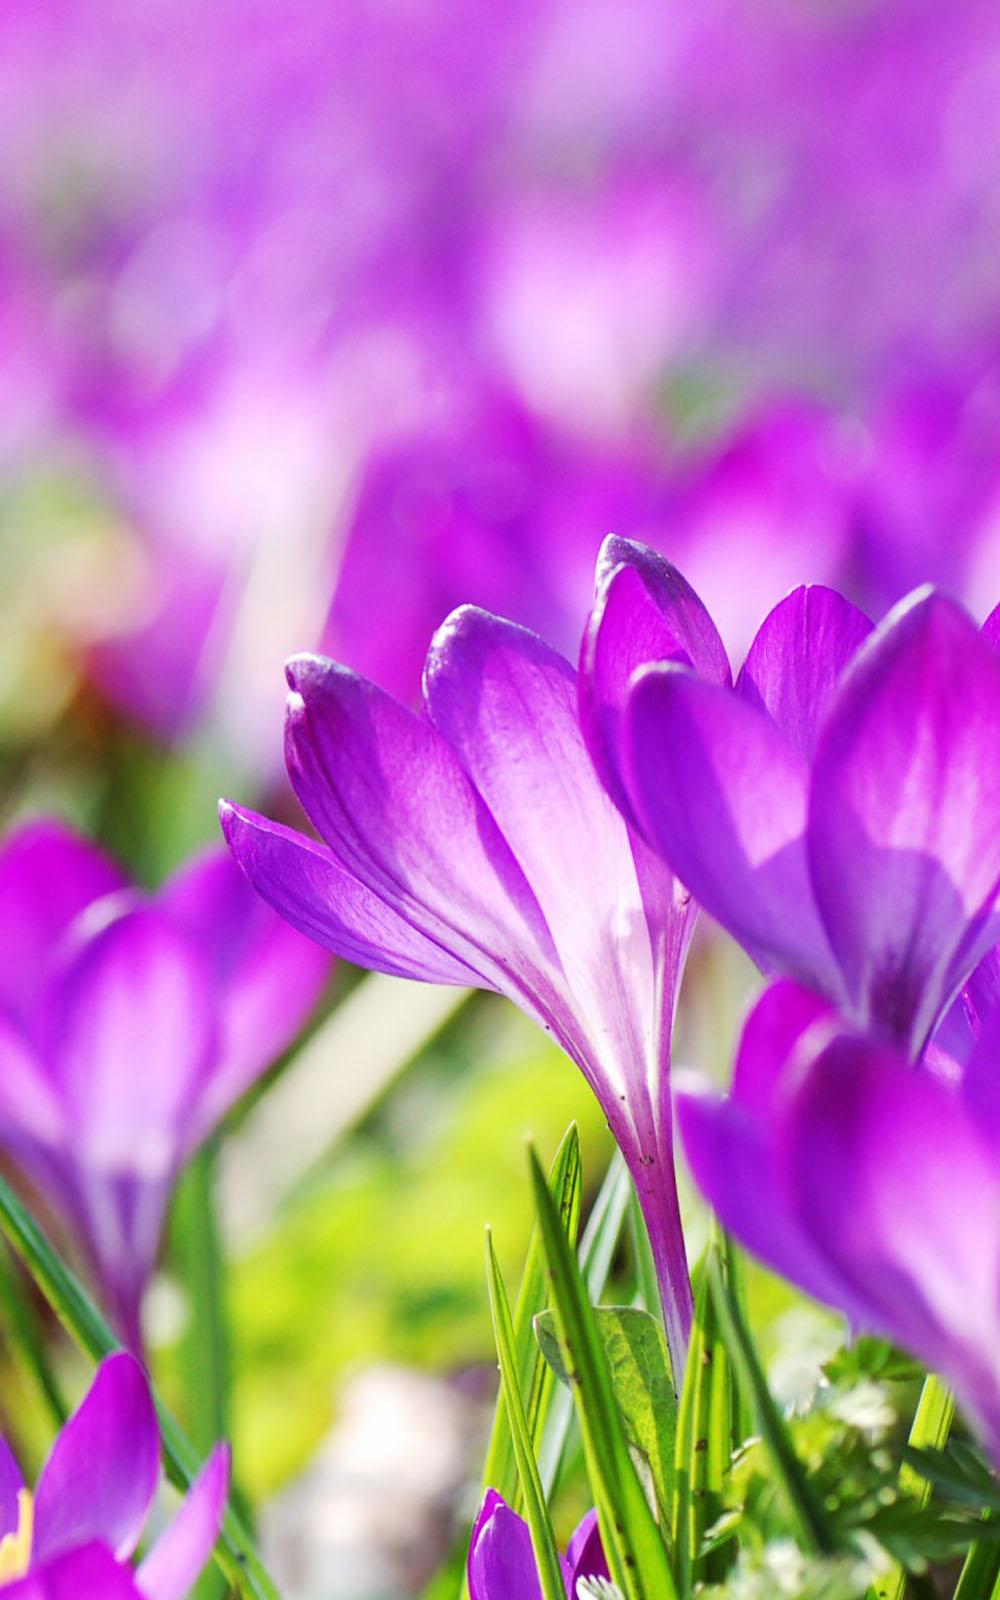 beautiful purple crocus flowers - download free hd mobile wallpapers